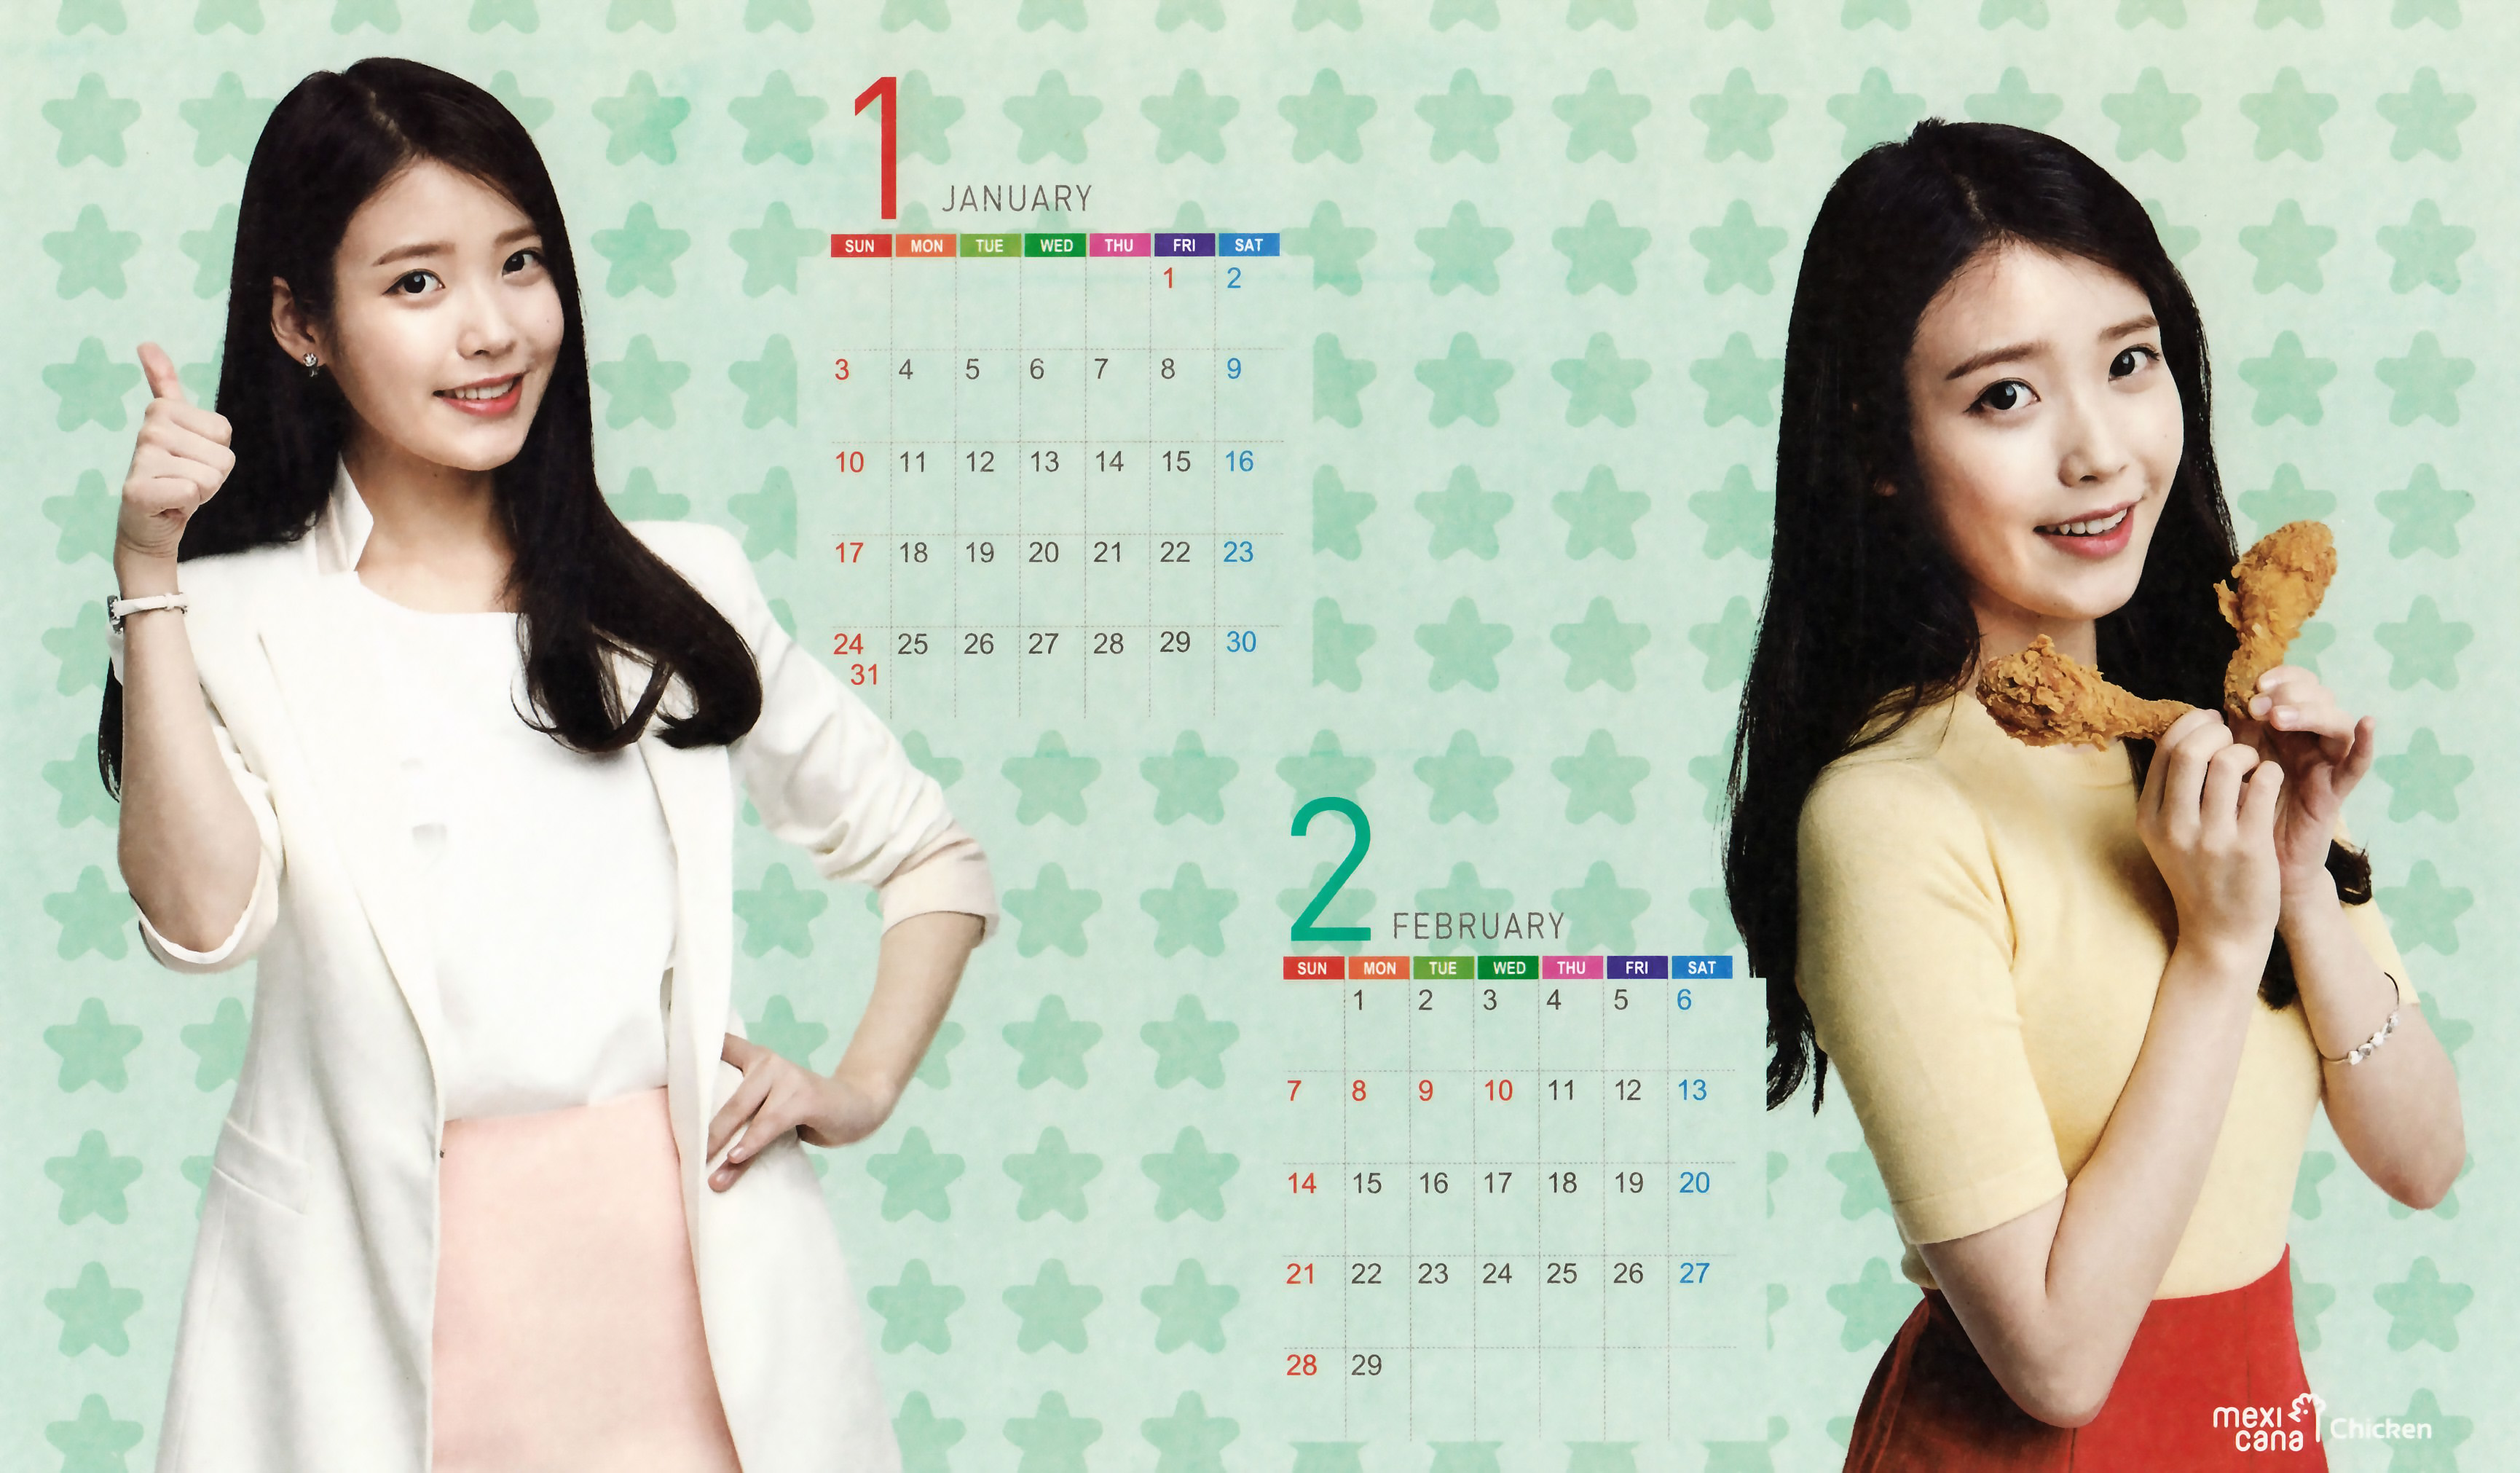 Iu 2022 Calendar.Scans 2016 Iu Mexicana Calendar By Iumushimushi Iu Photo 39458530 Fanpop